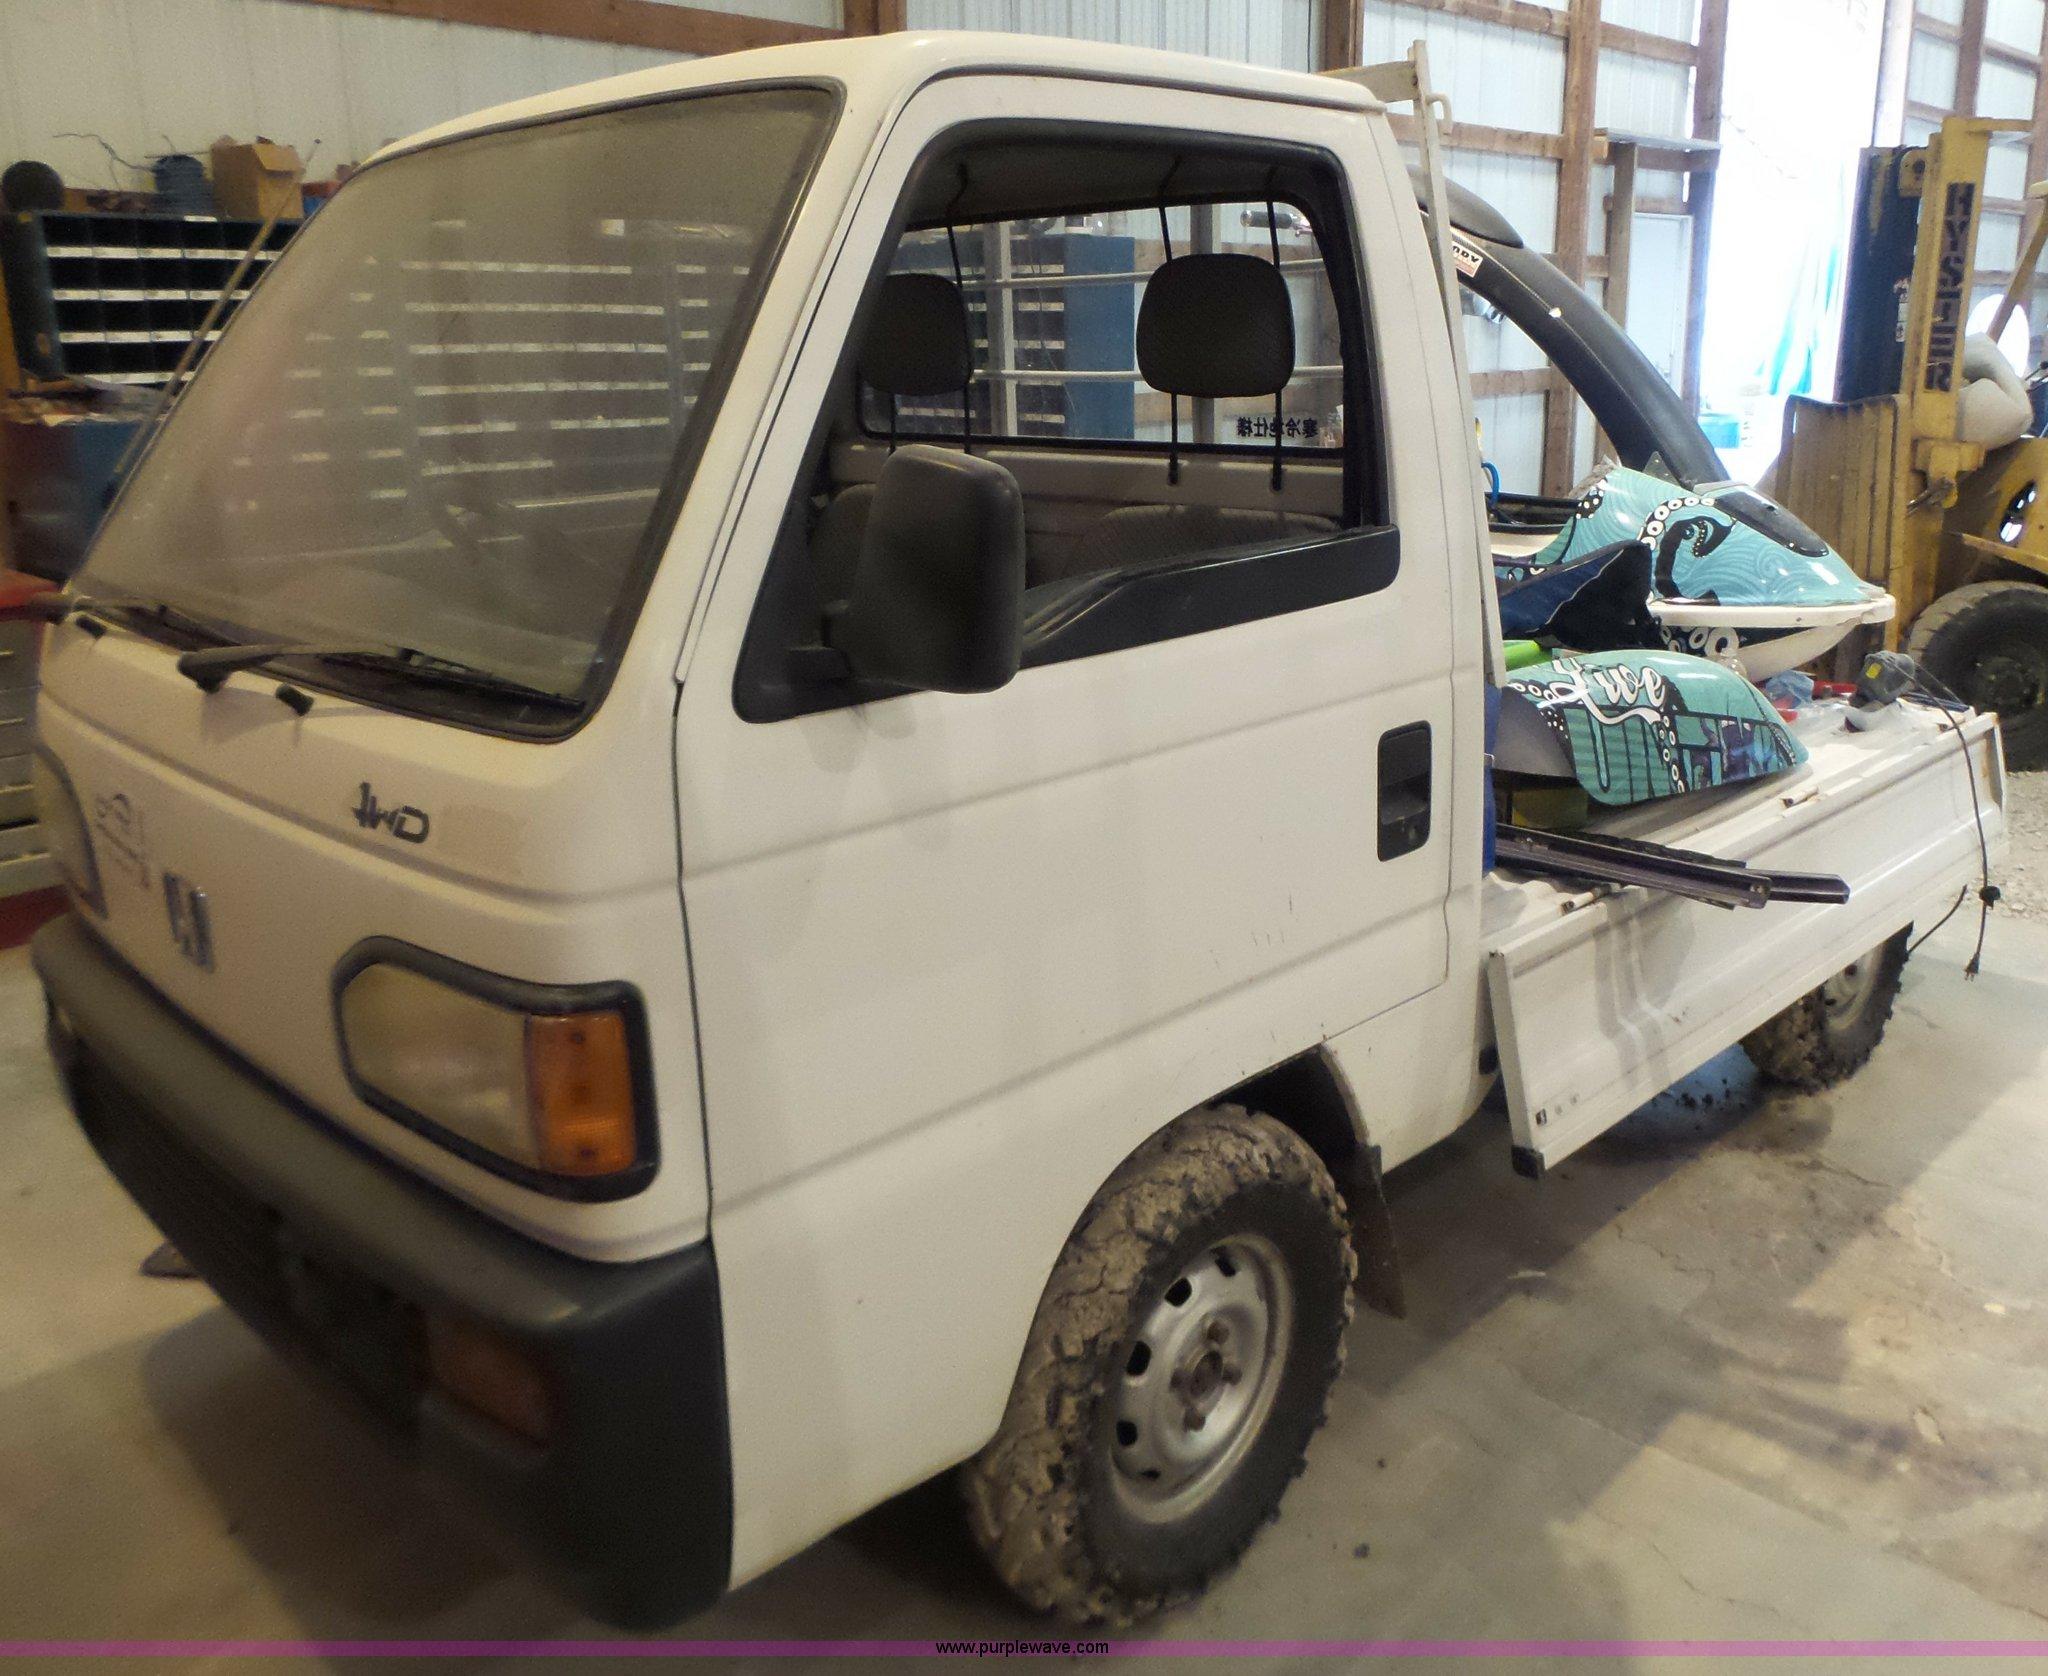 version cruz will tailgate pickup down in news hyundai of trucks market rendering u concept s bed long santa rear prevnext